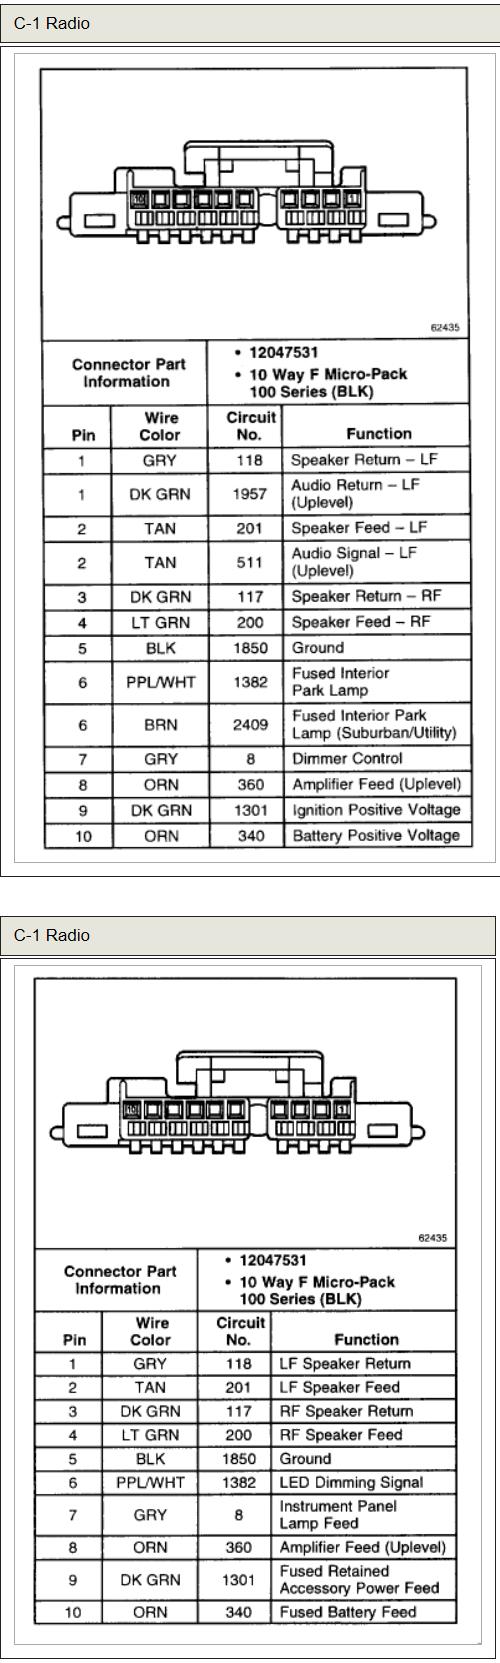 Chevy Tahoe Radio Wiring Diagram | Manual E-Books - 2002 Chevy Tahoe Radio Wiring Diagram